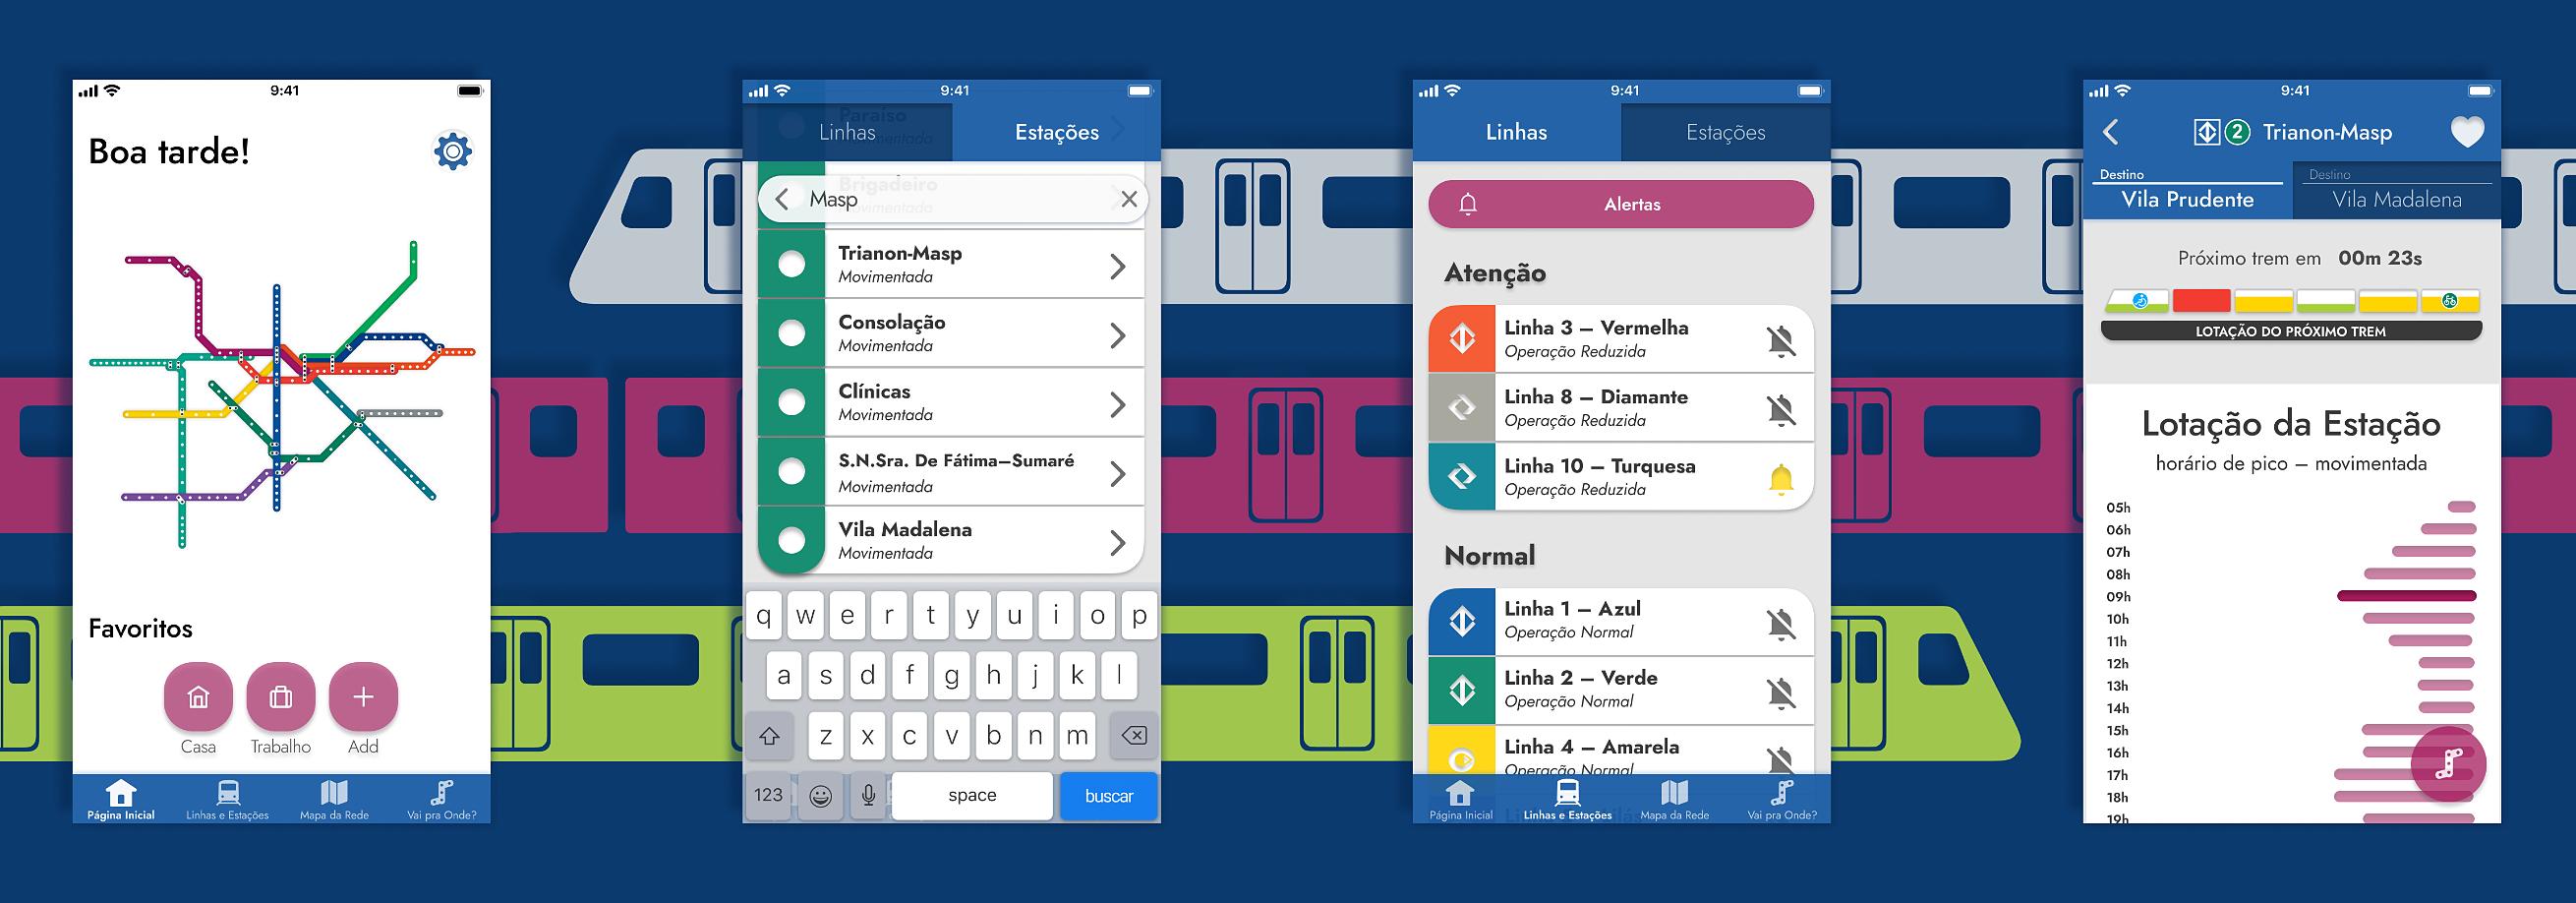 Picture: Victor's Metro SP App Redesign.